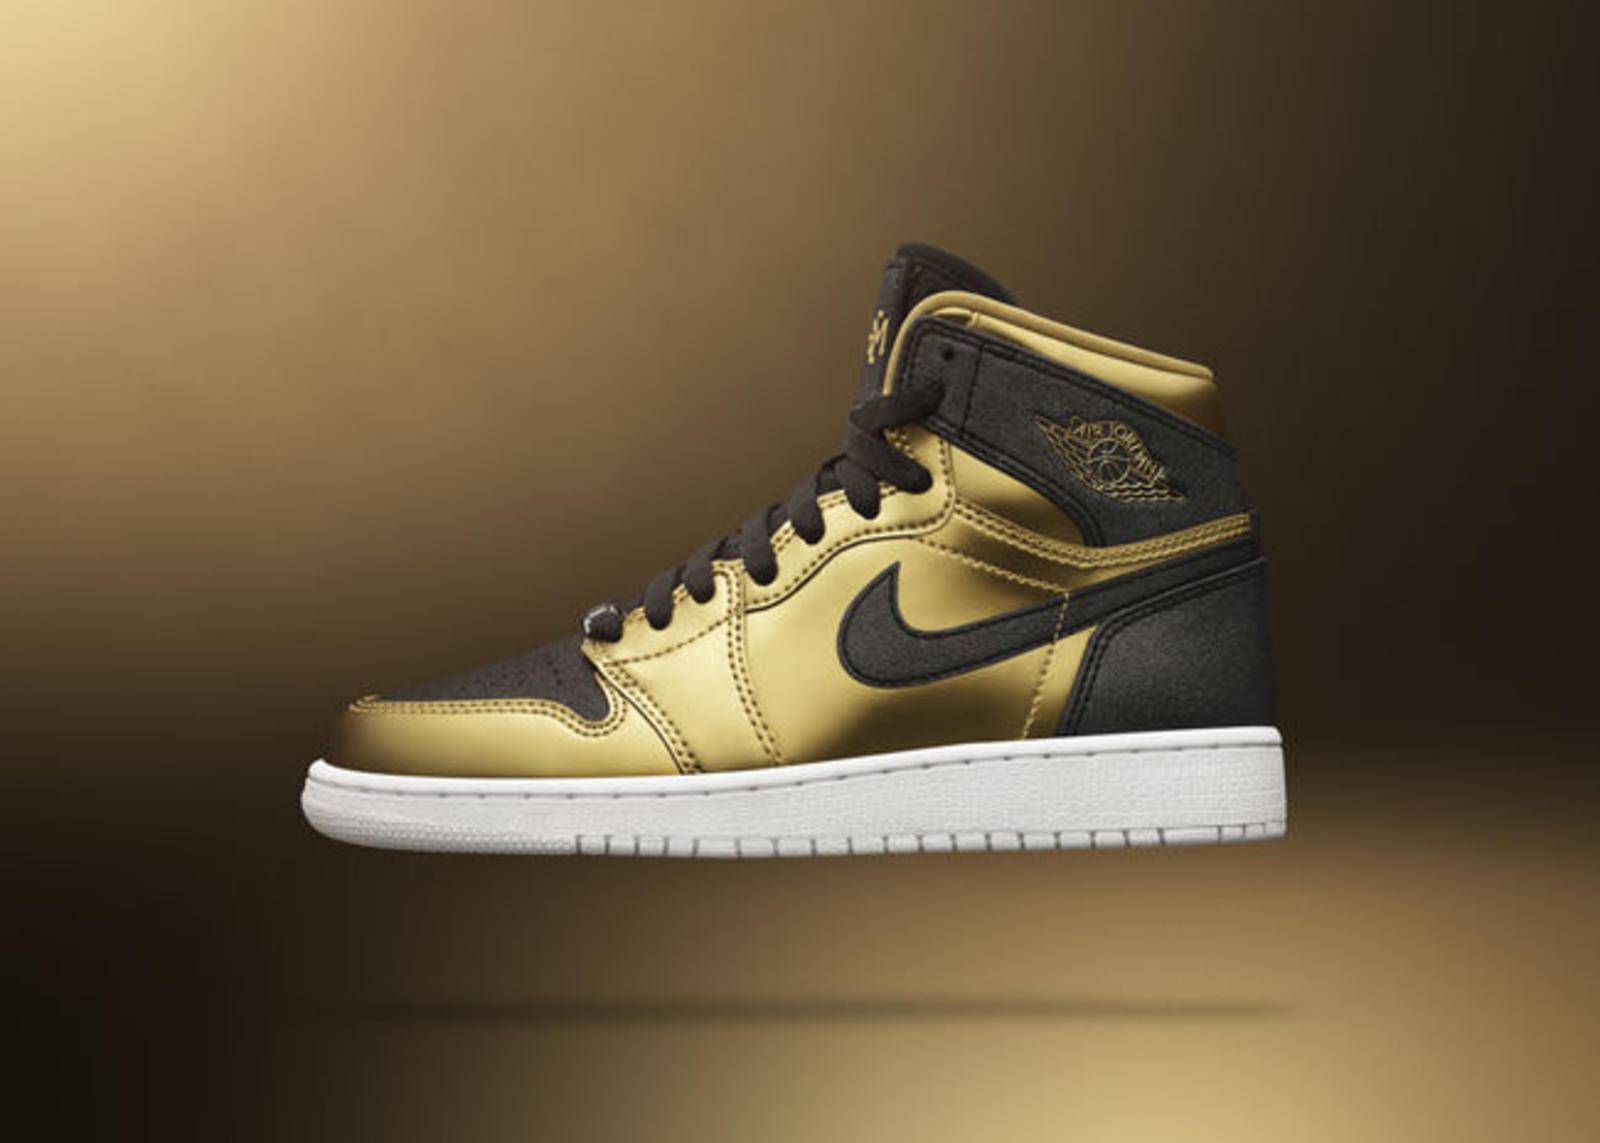 Nike Kd Jacket